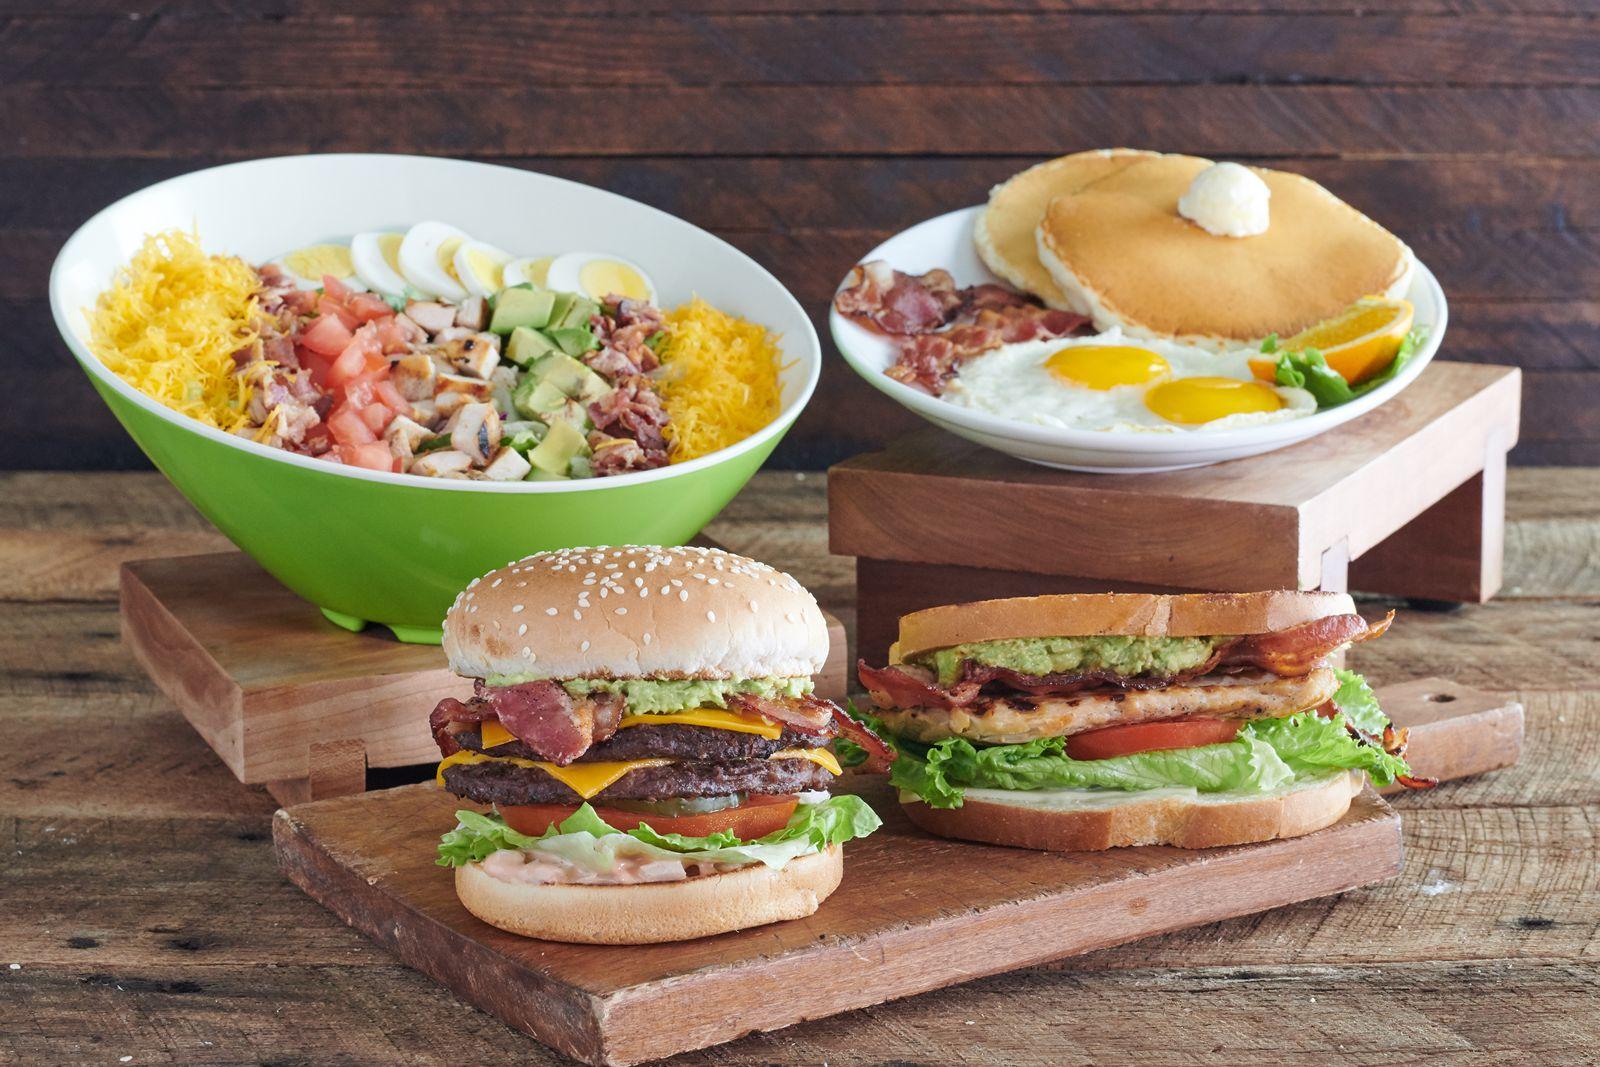 Farmer Boys To Open New Murrieta Restaurant in August